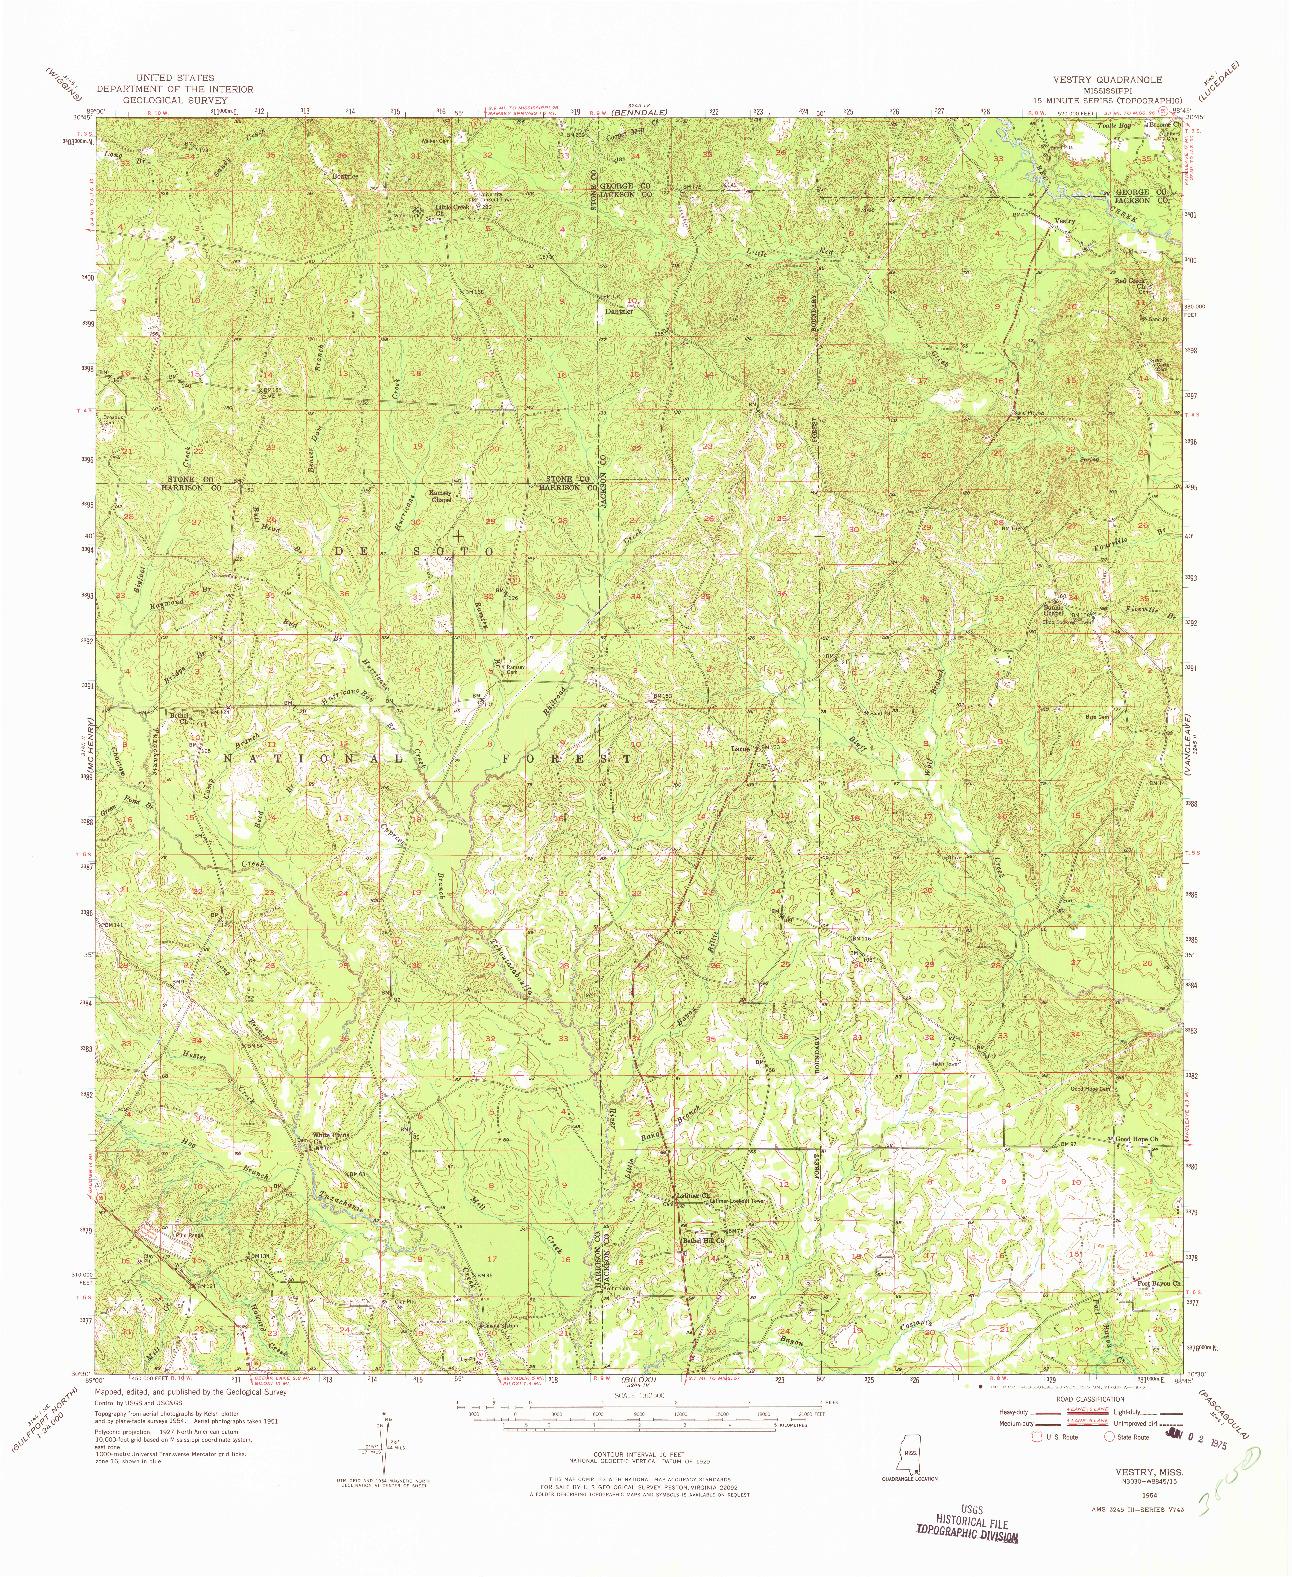 USGS 1:62500-SCALE QUADRANGLE FOR VESTRY, MS 1954